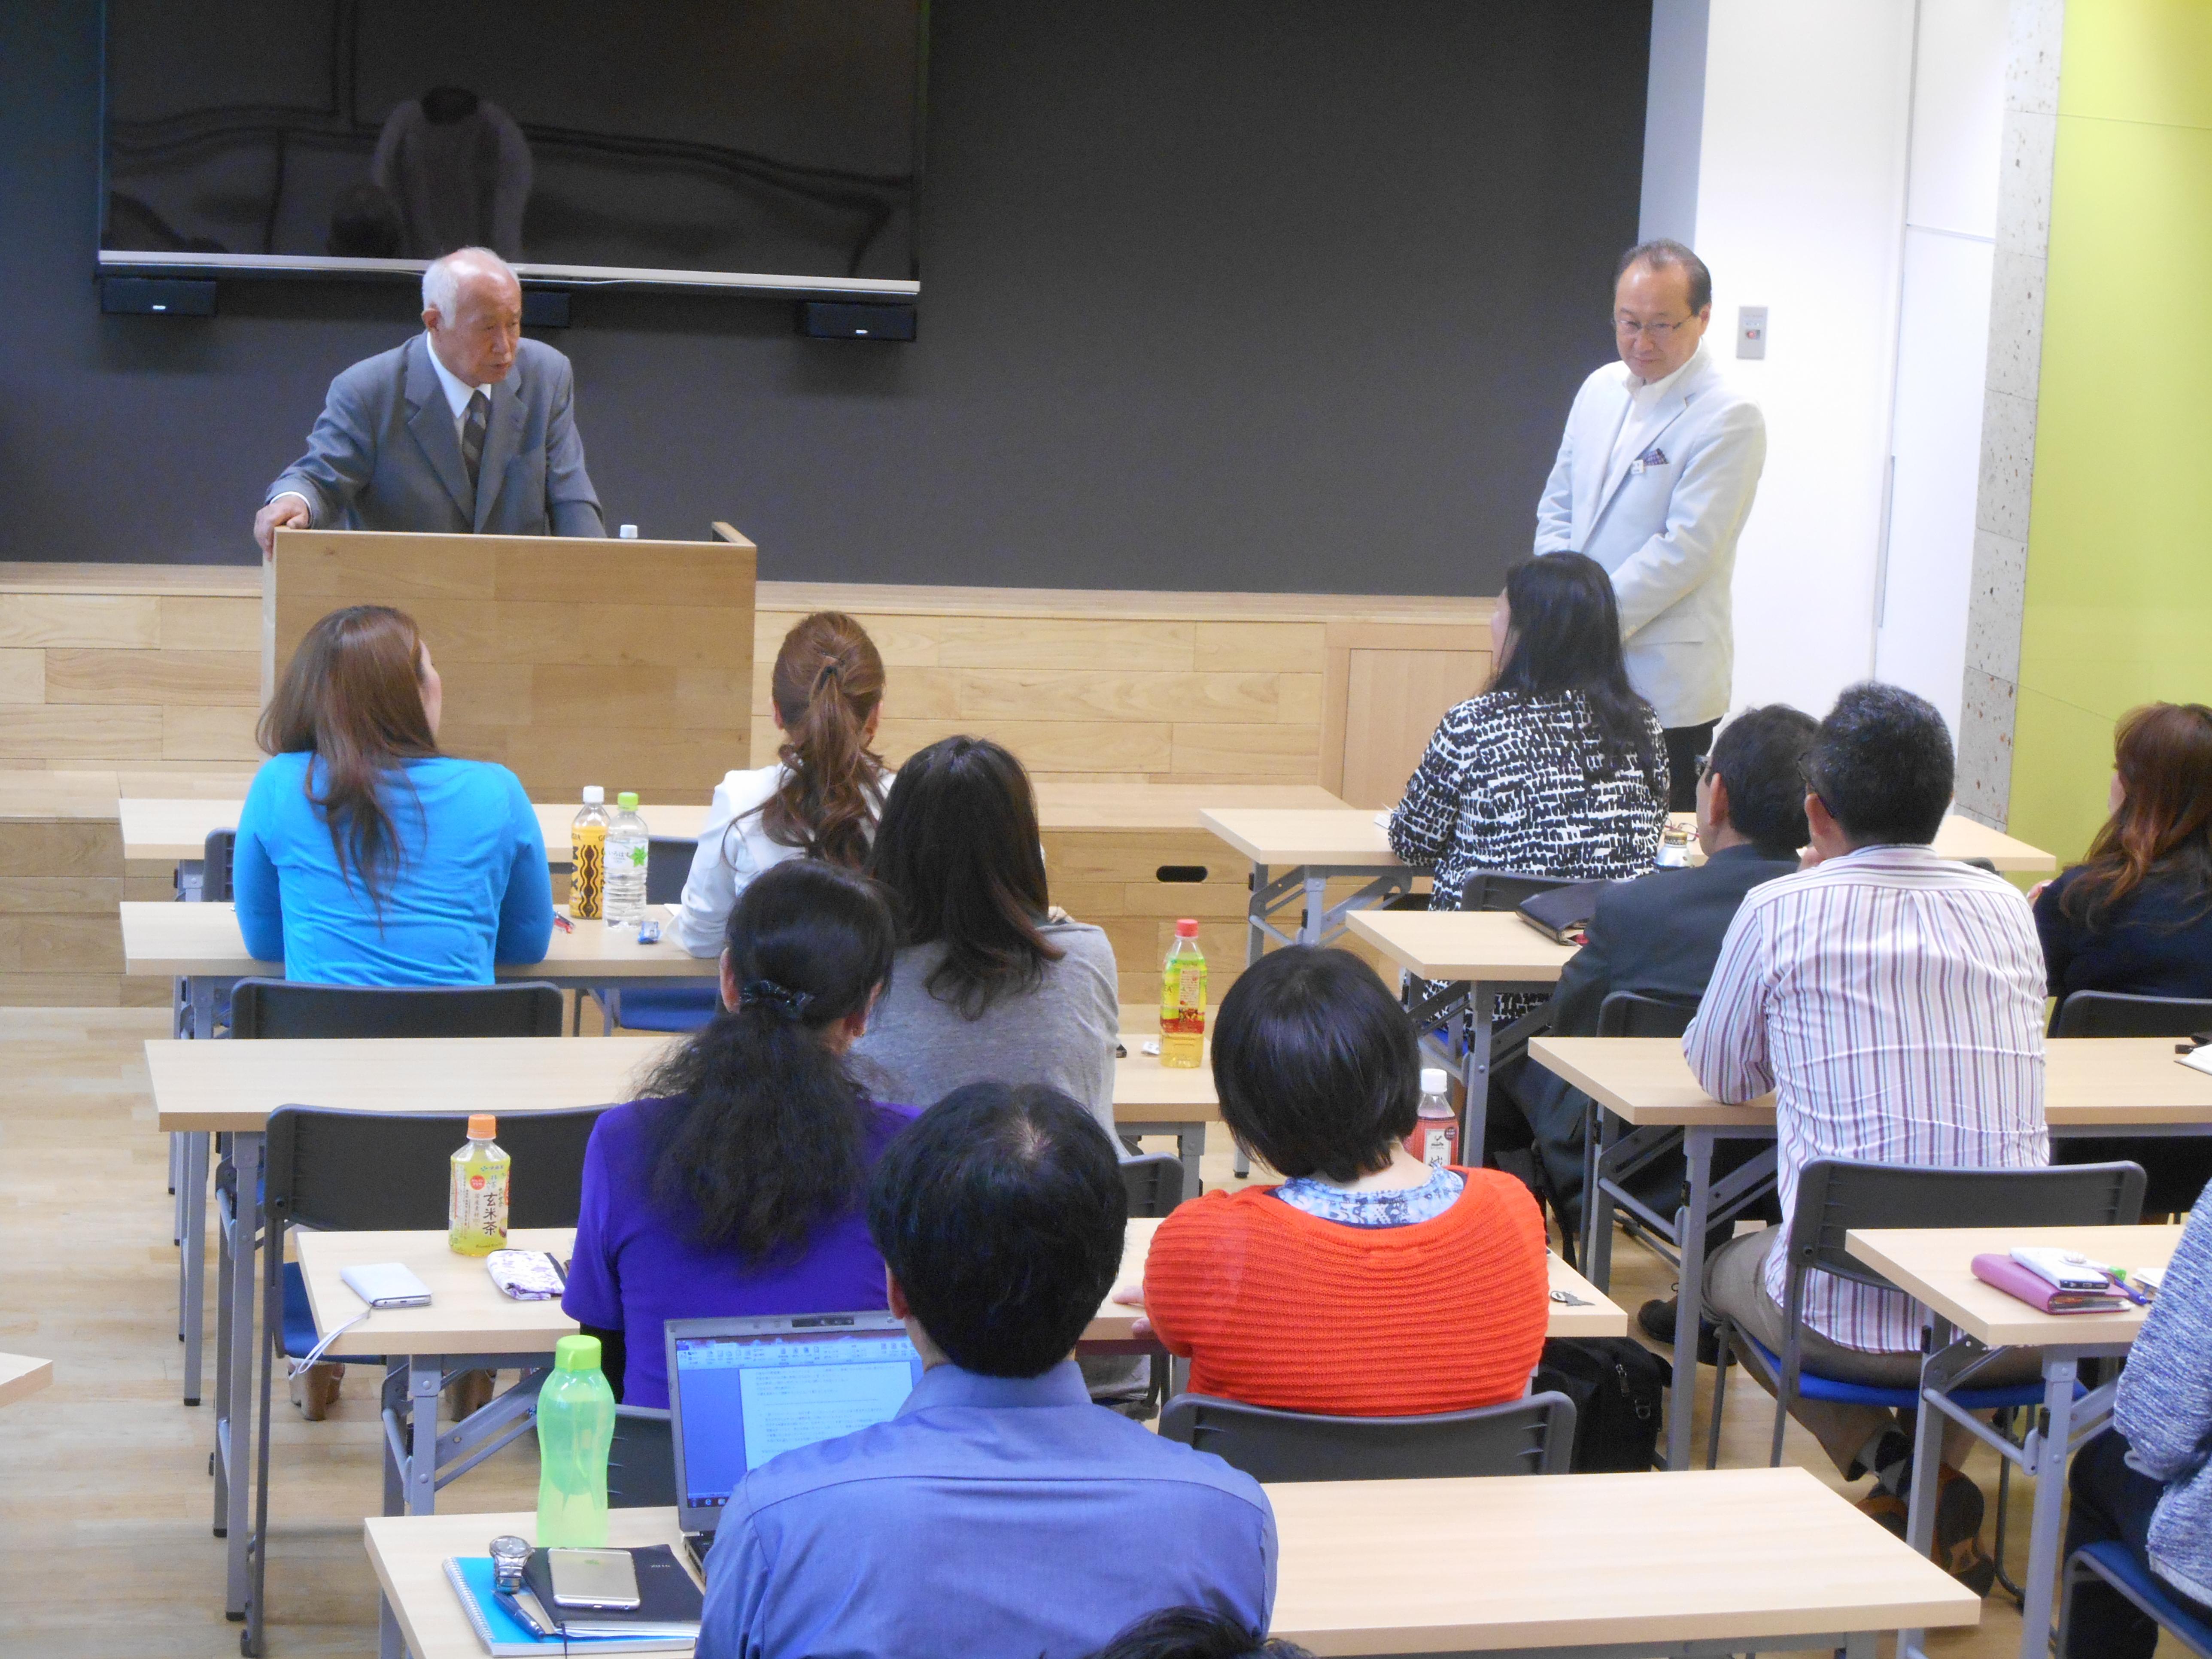 DSCN1703 - 4月1日東京思風塾の開催になります。